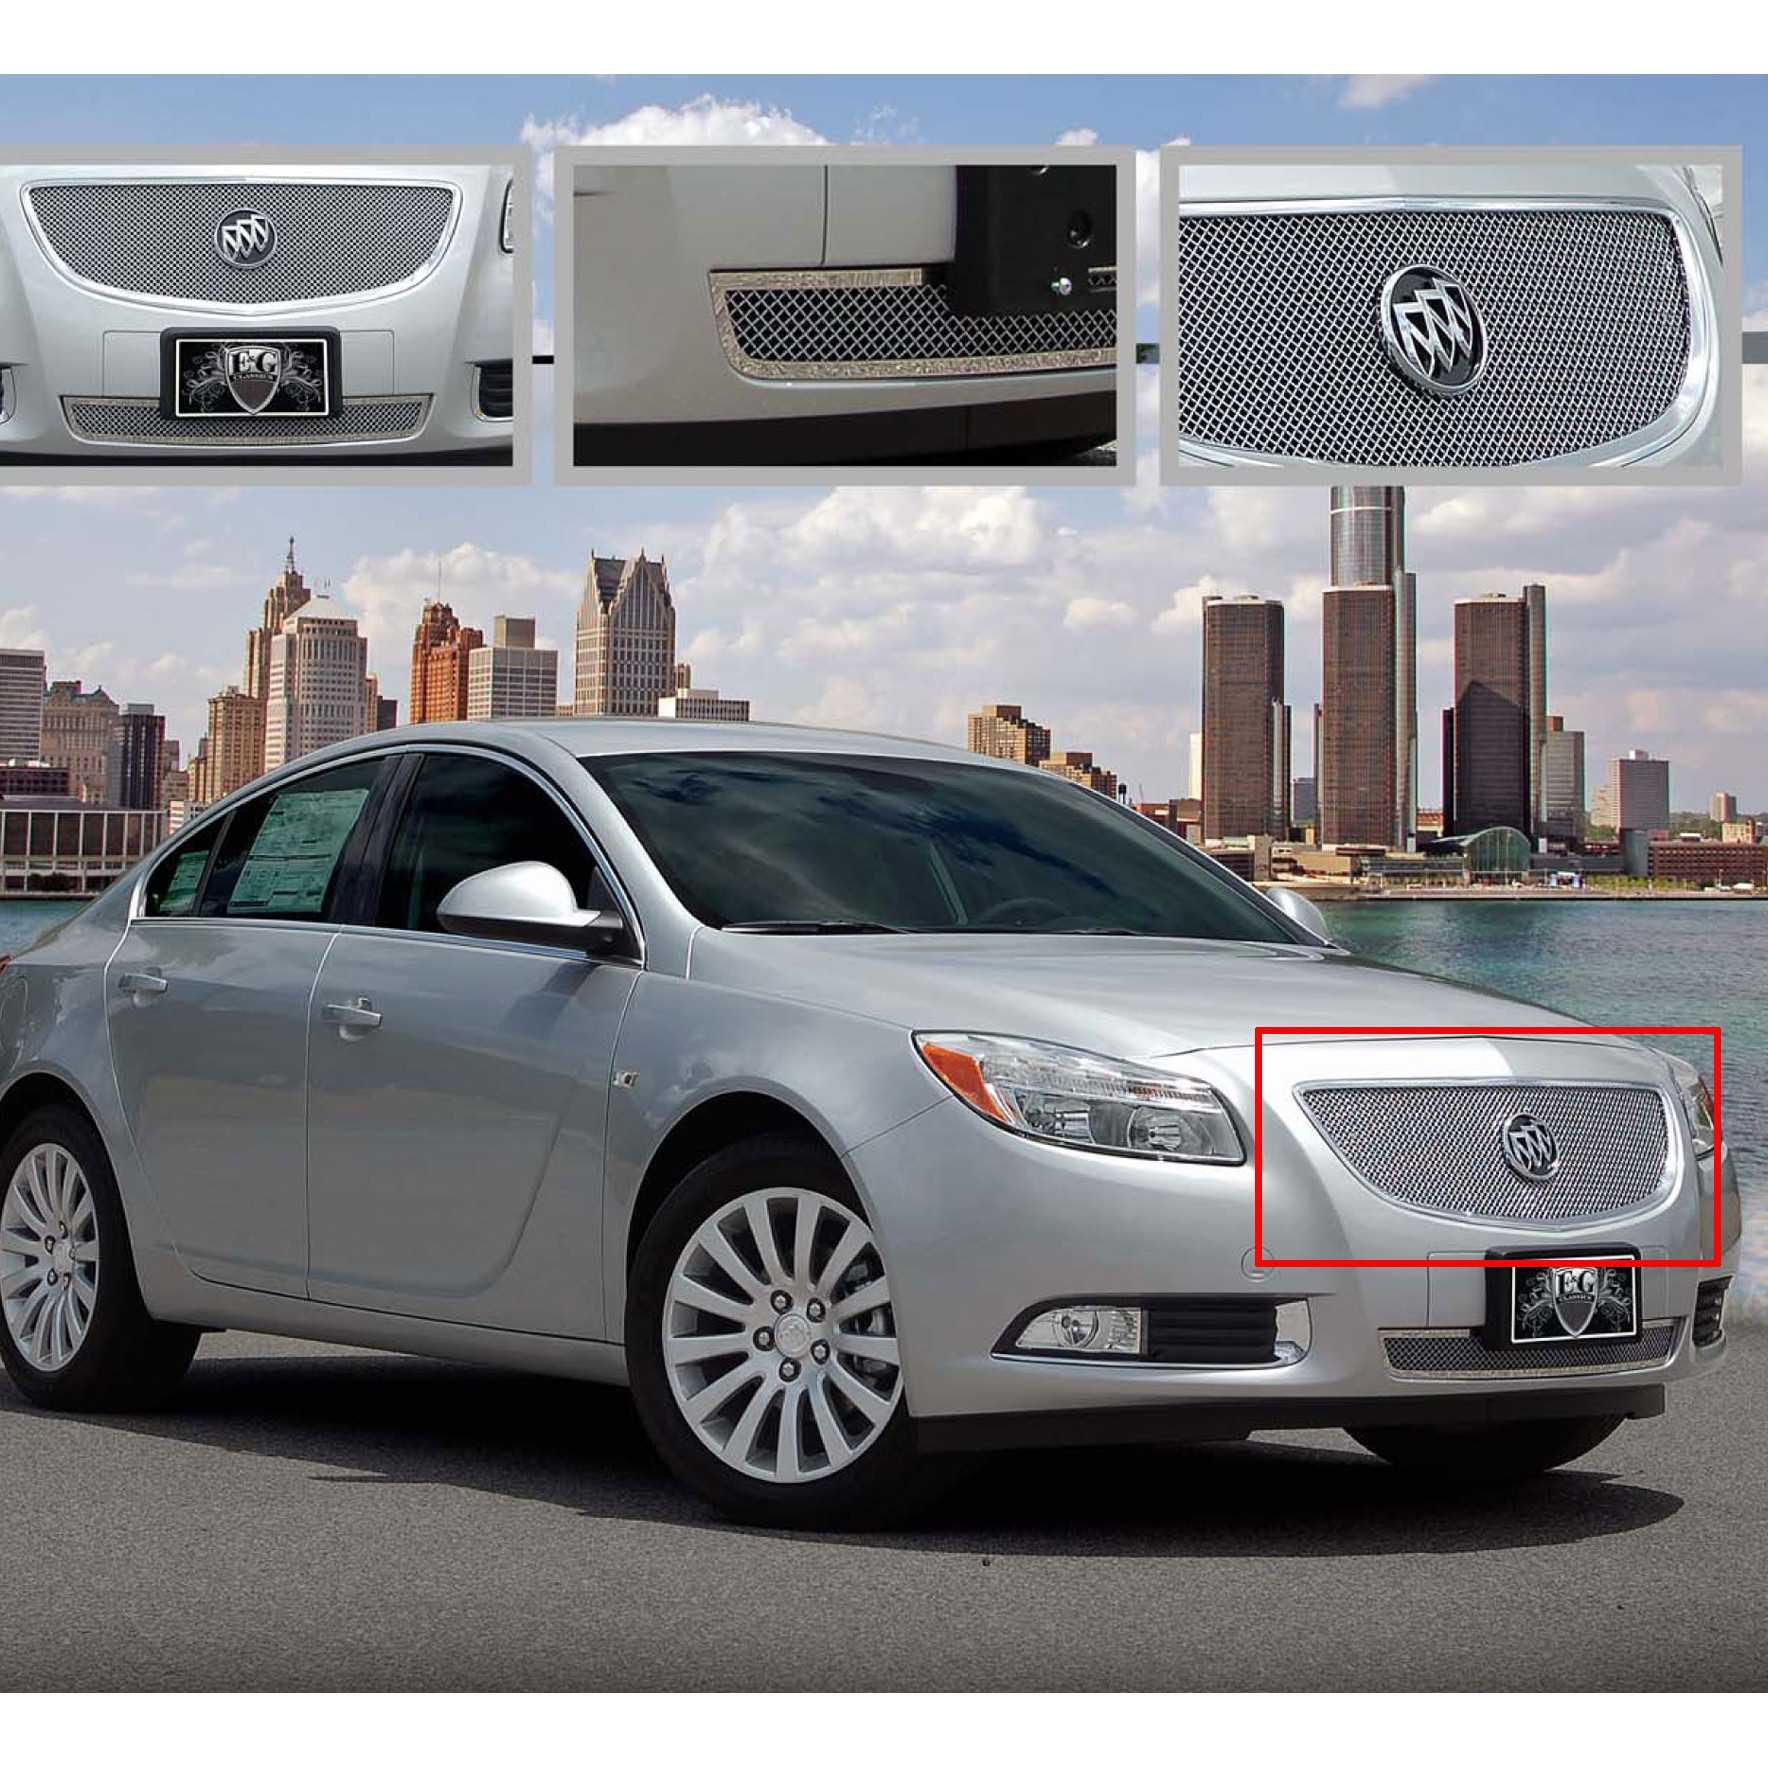 2013 Buicks: E&G Classics 2011-2013 Buick Regal Grille Fine Mesh Grille